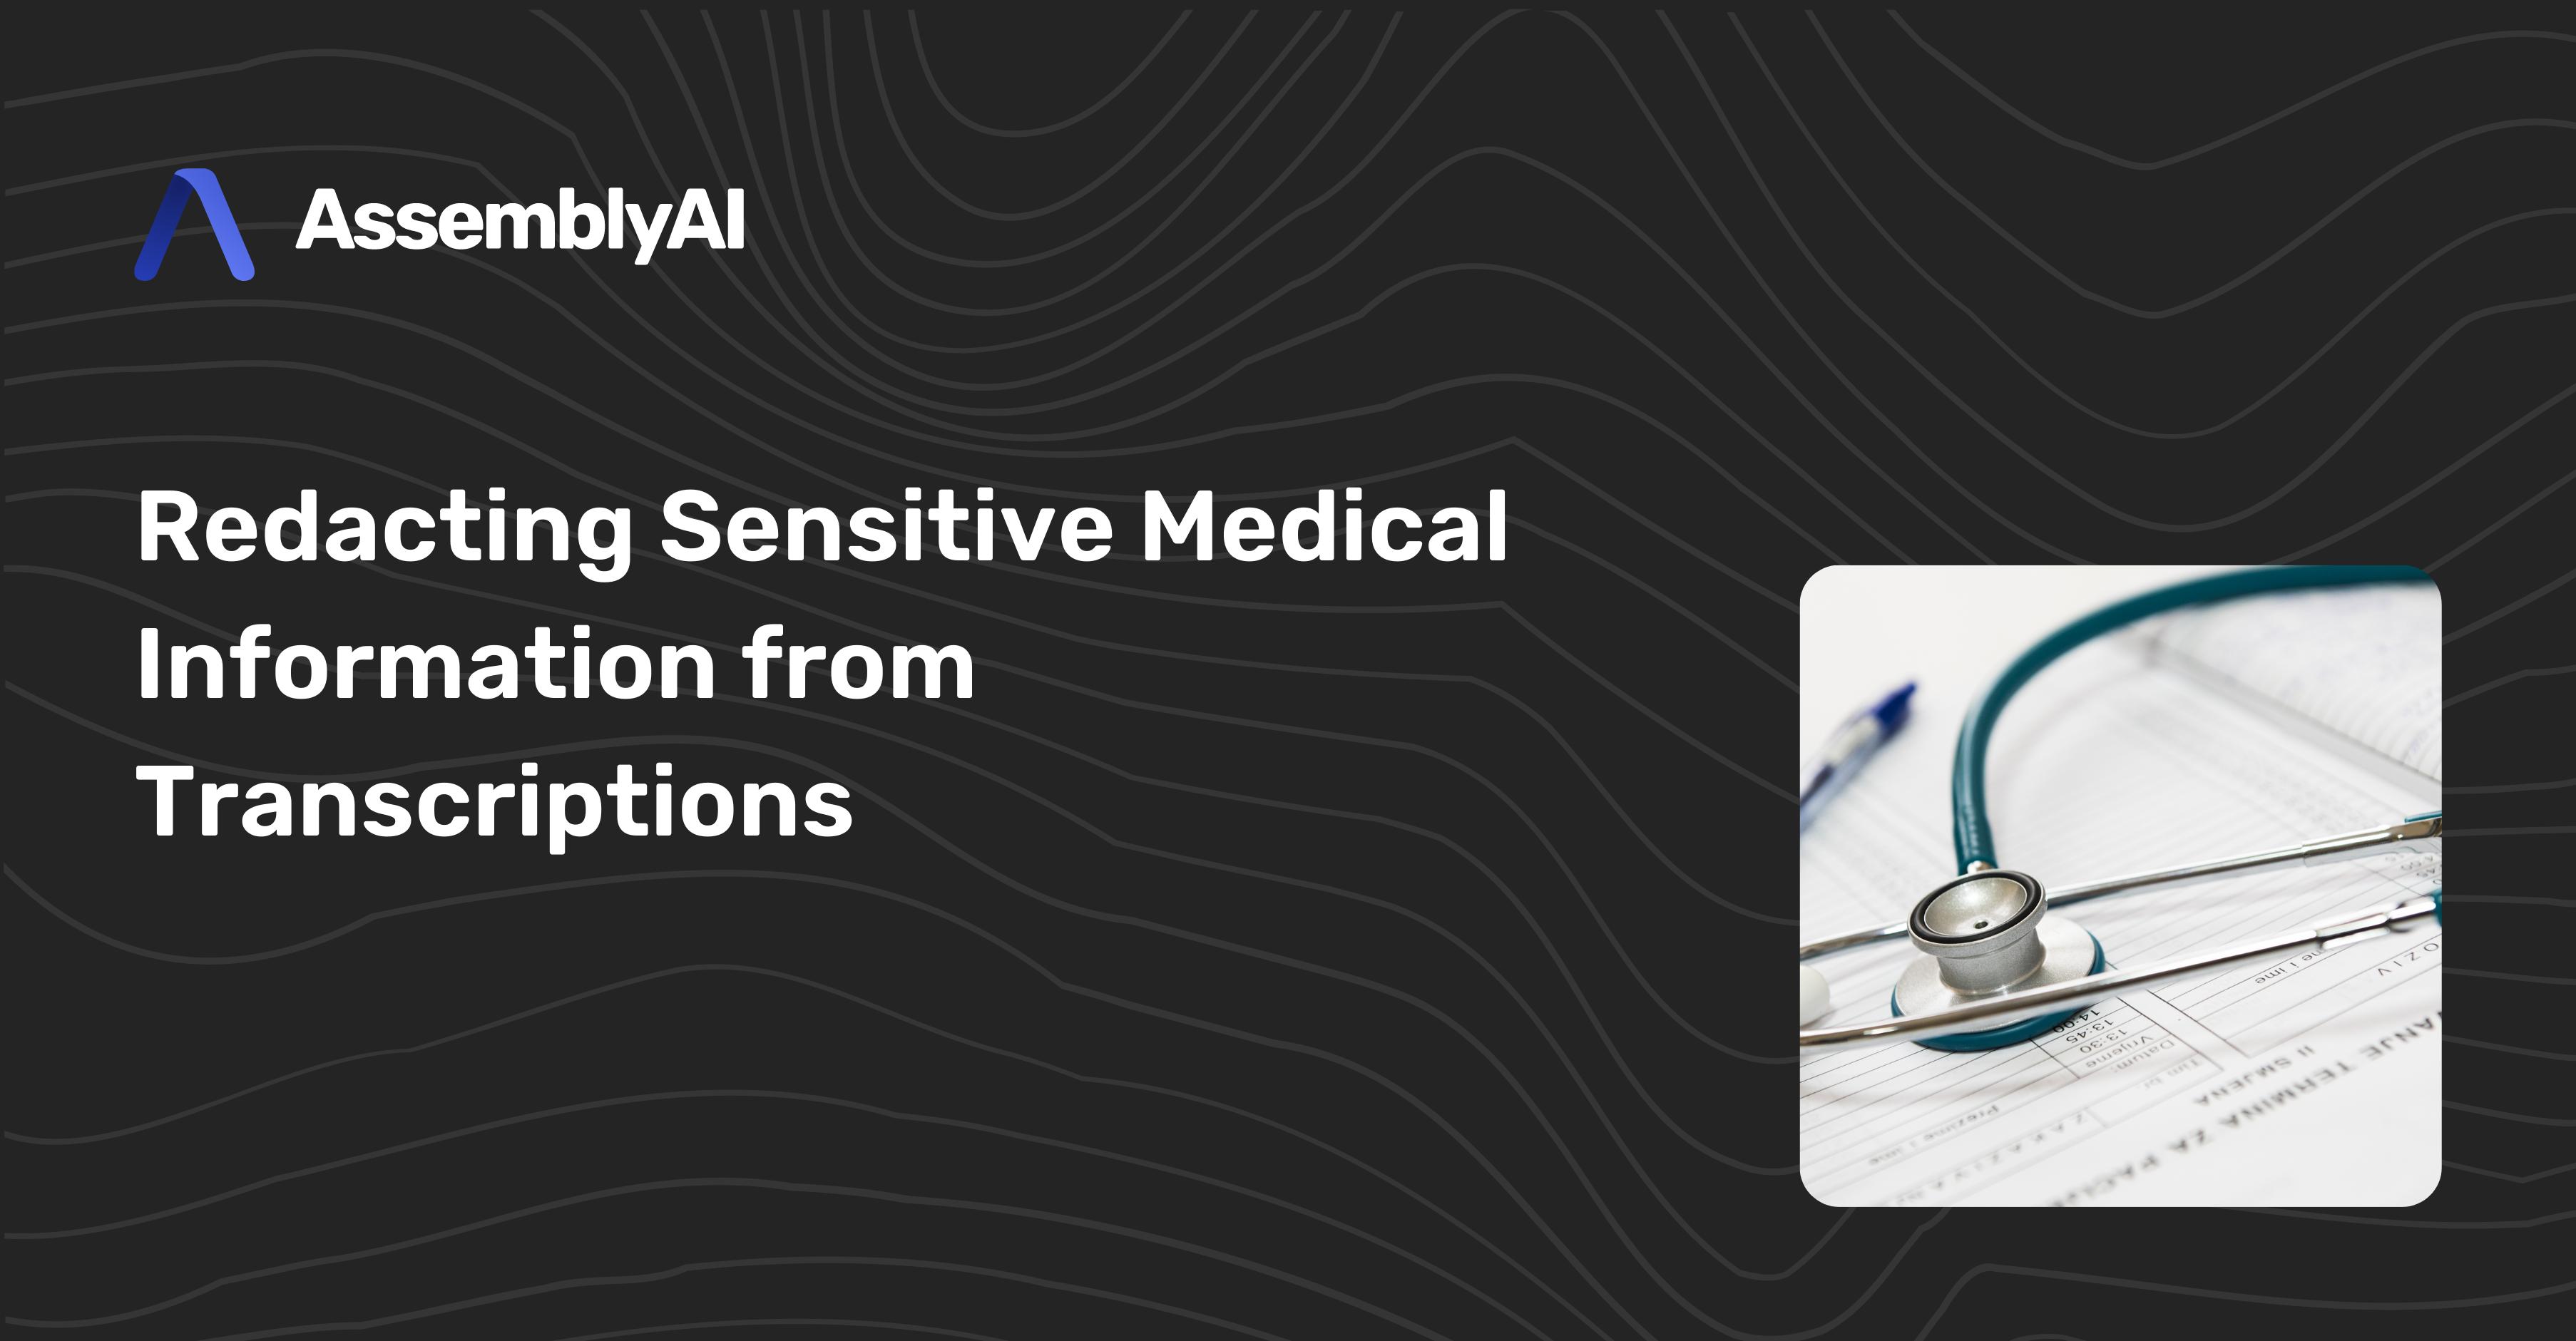 Redacting Sensitive Medical Information from Transcriptions